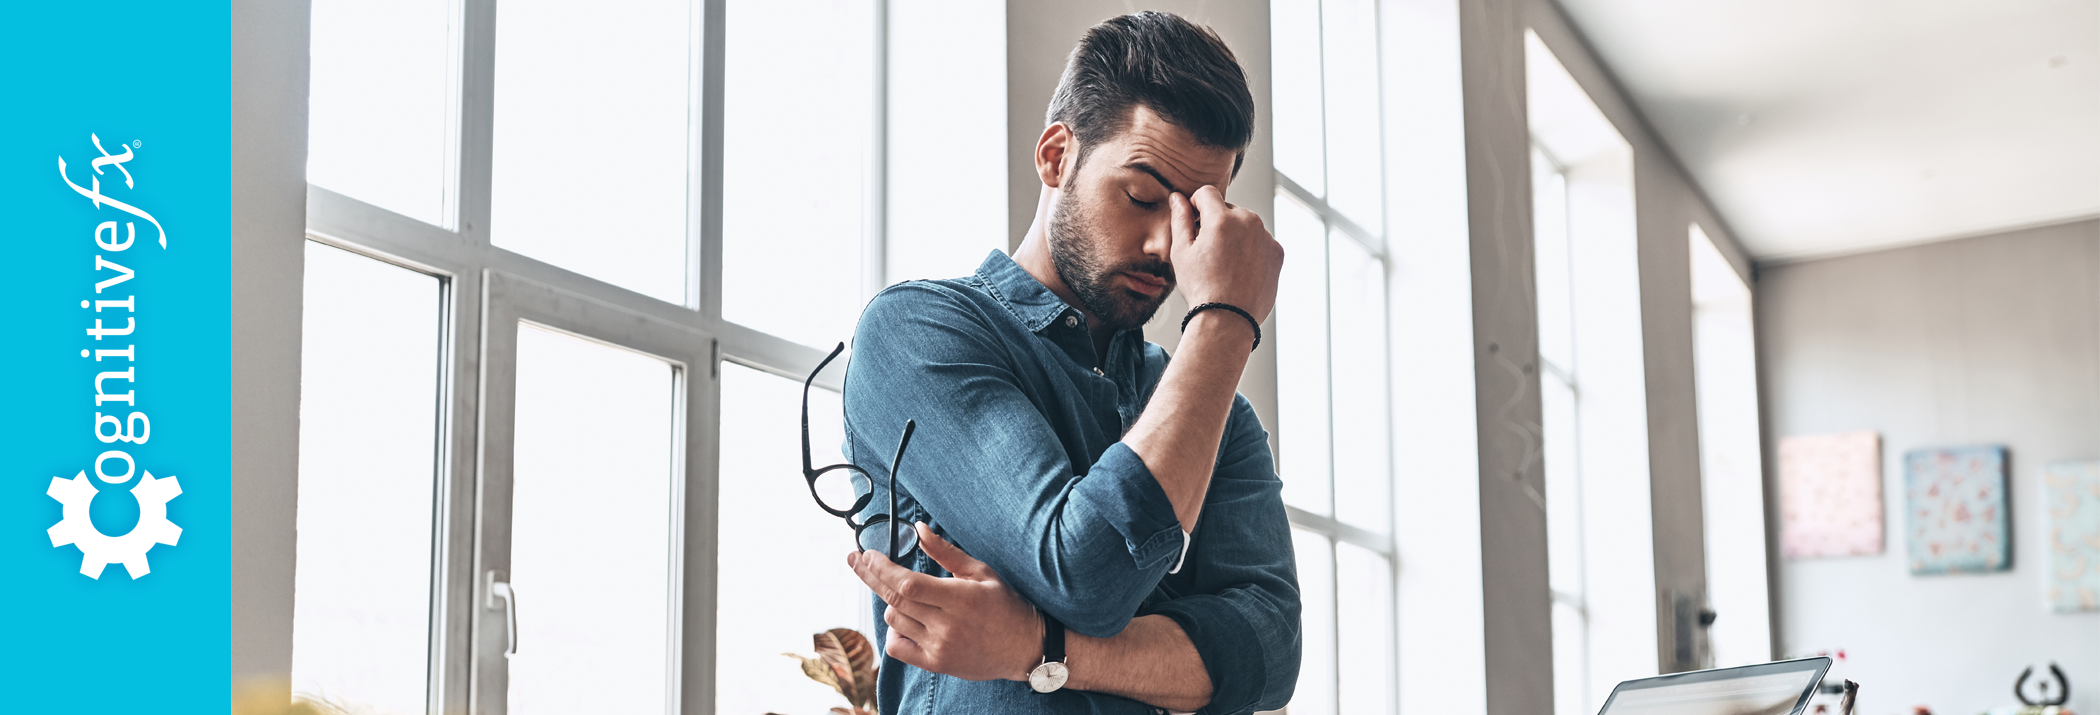 3 Ways Stress Impacts the Brain